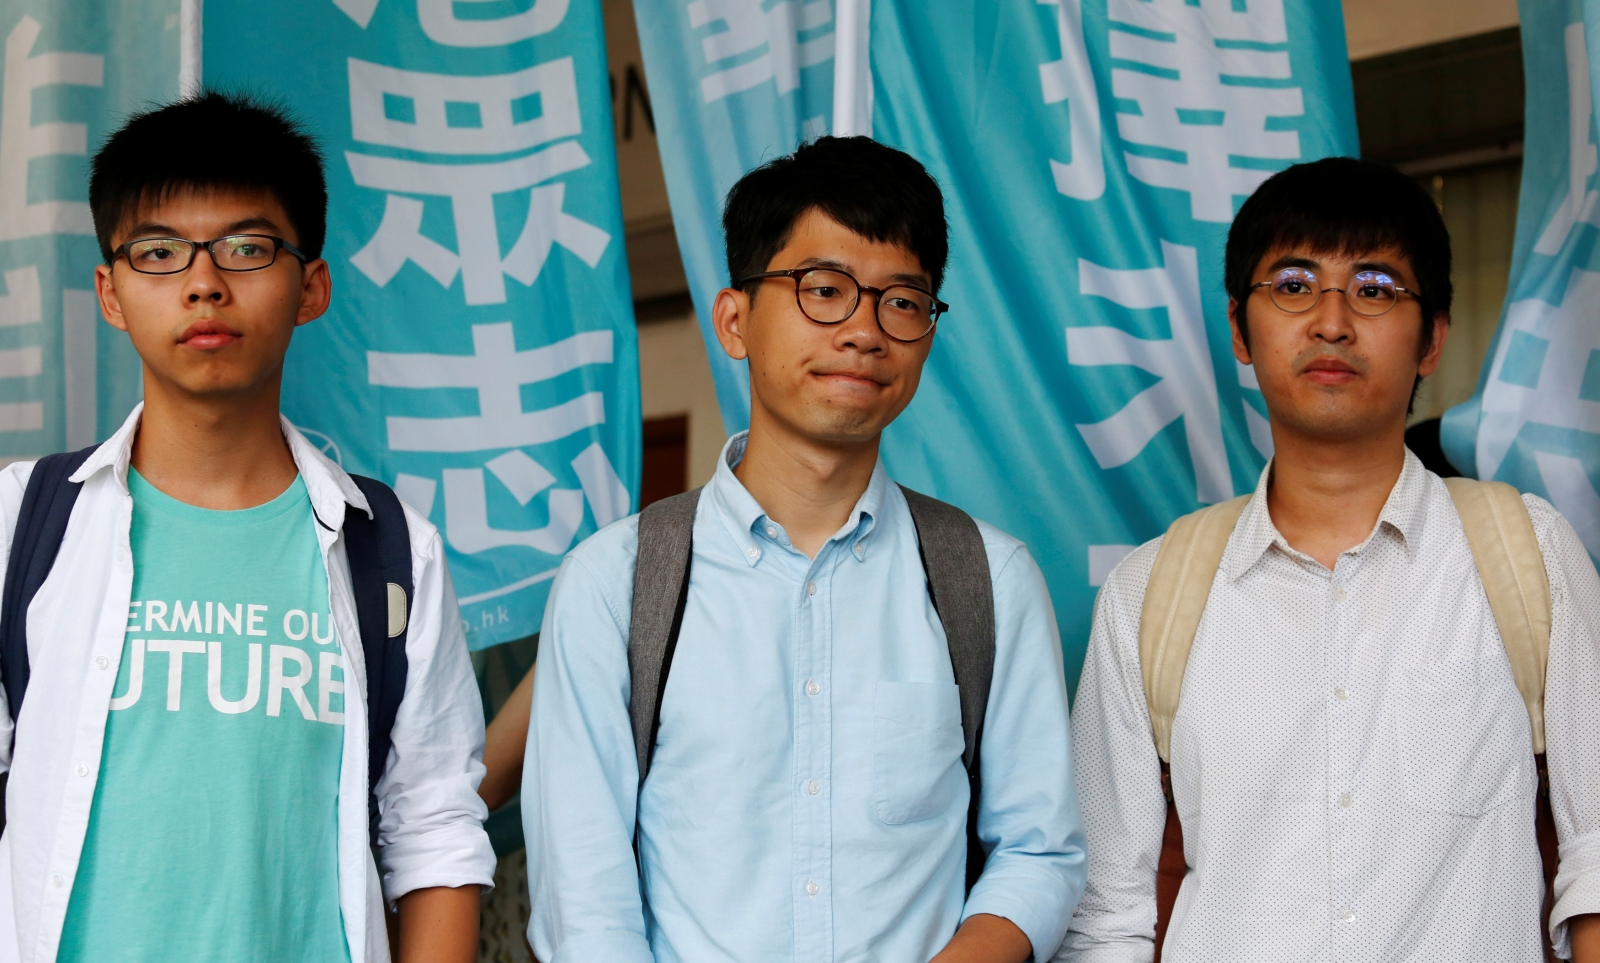 Hong Kong student leaders